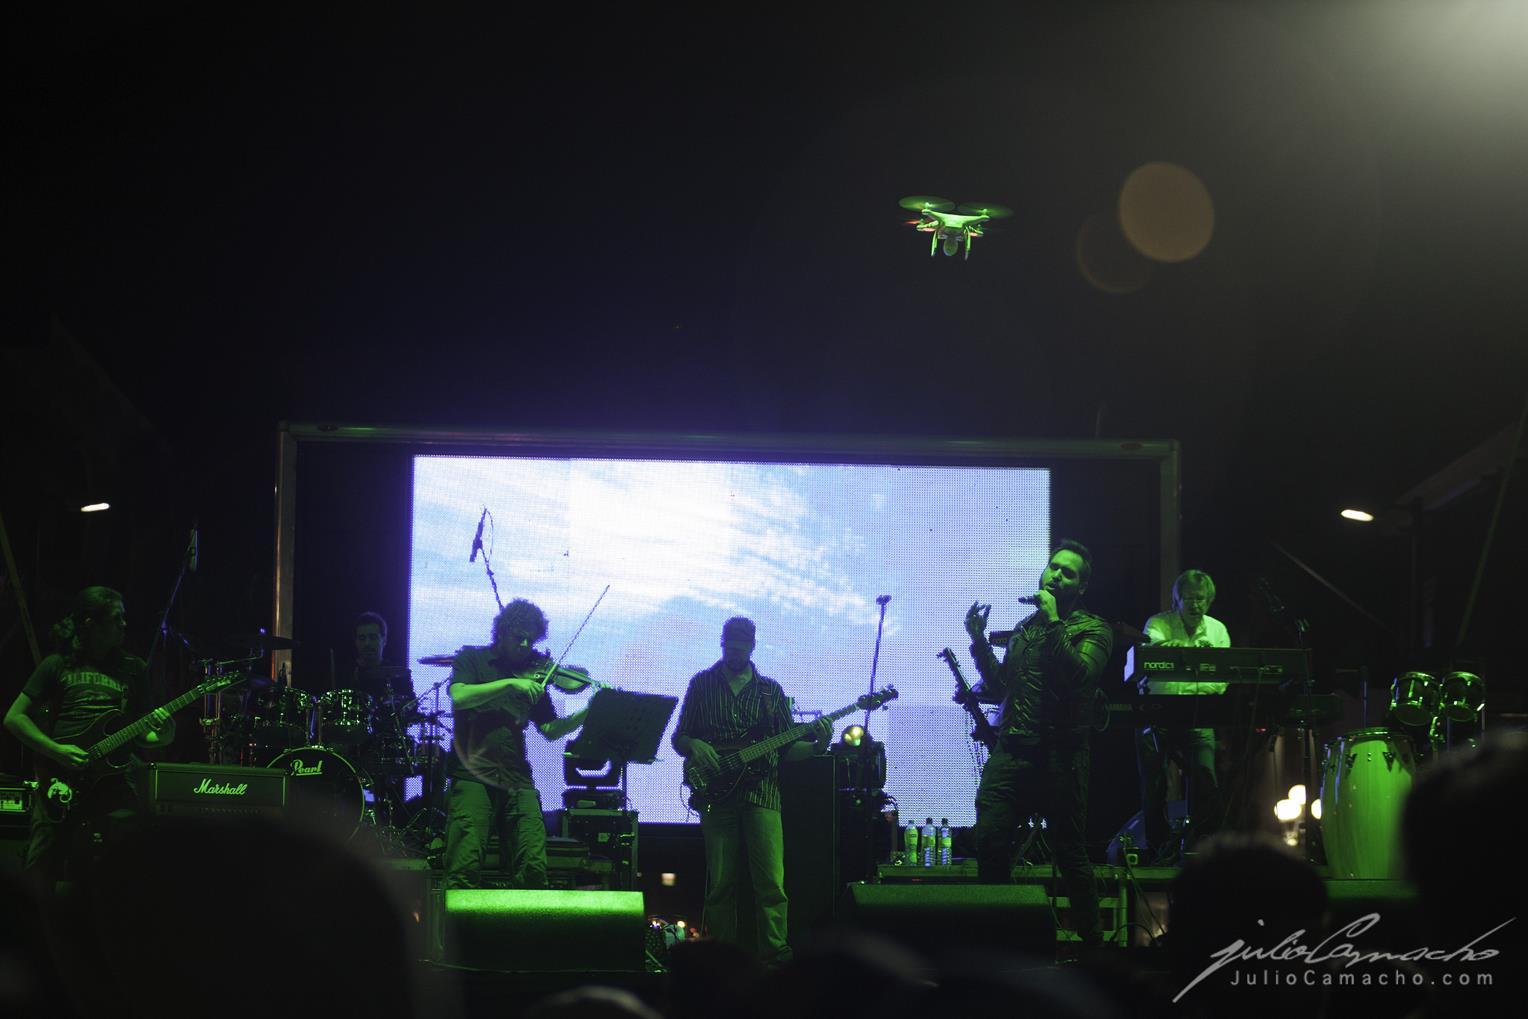 2014-10-30 31 CAST TOUR Ensenada y Tijuana - 1408 - www.Juli (Copy).jpg